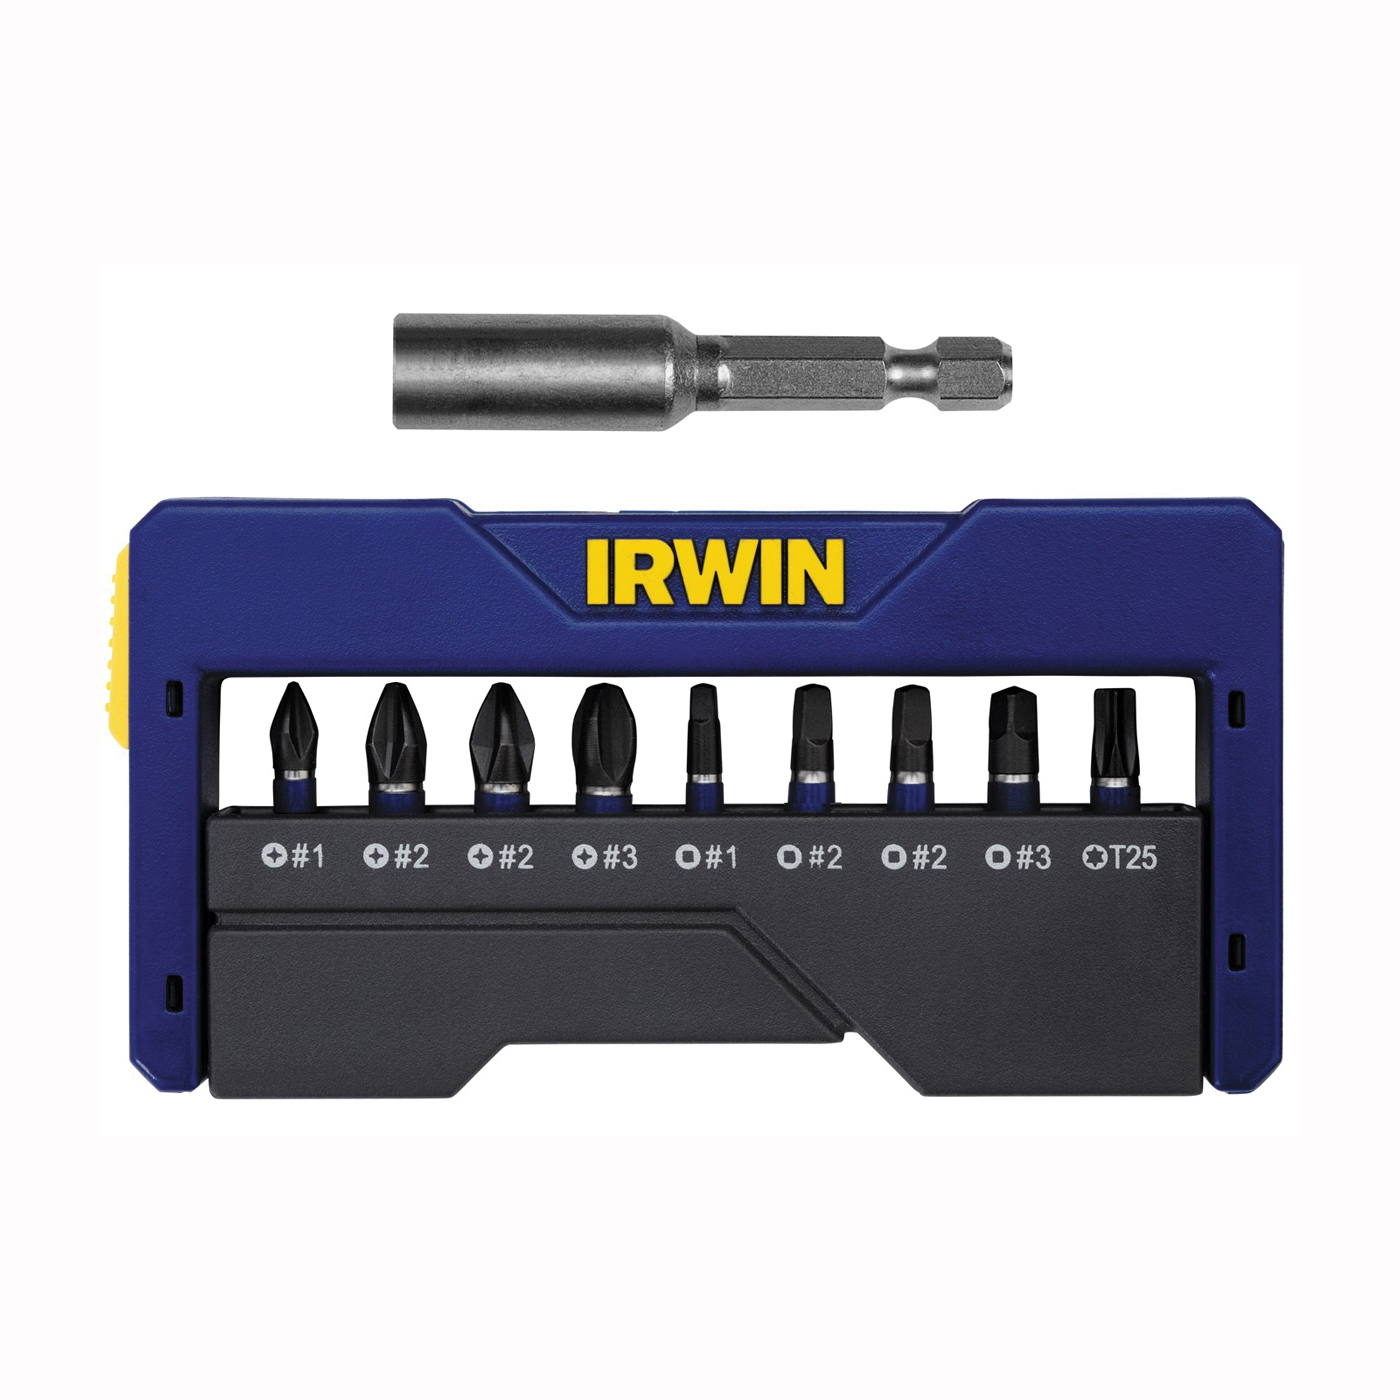 IRWIN 1866983